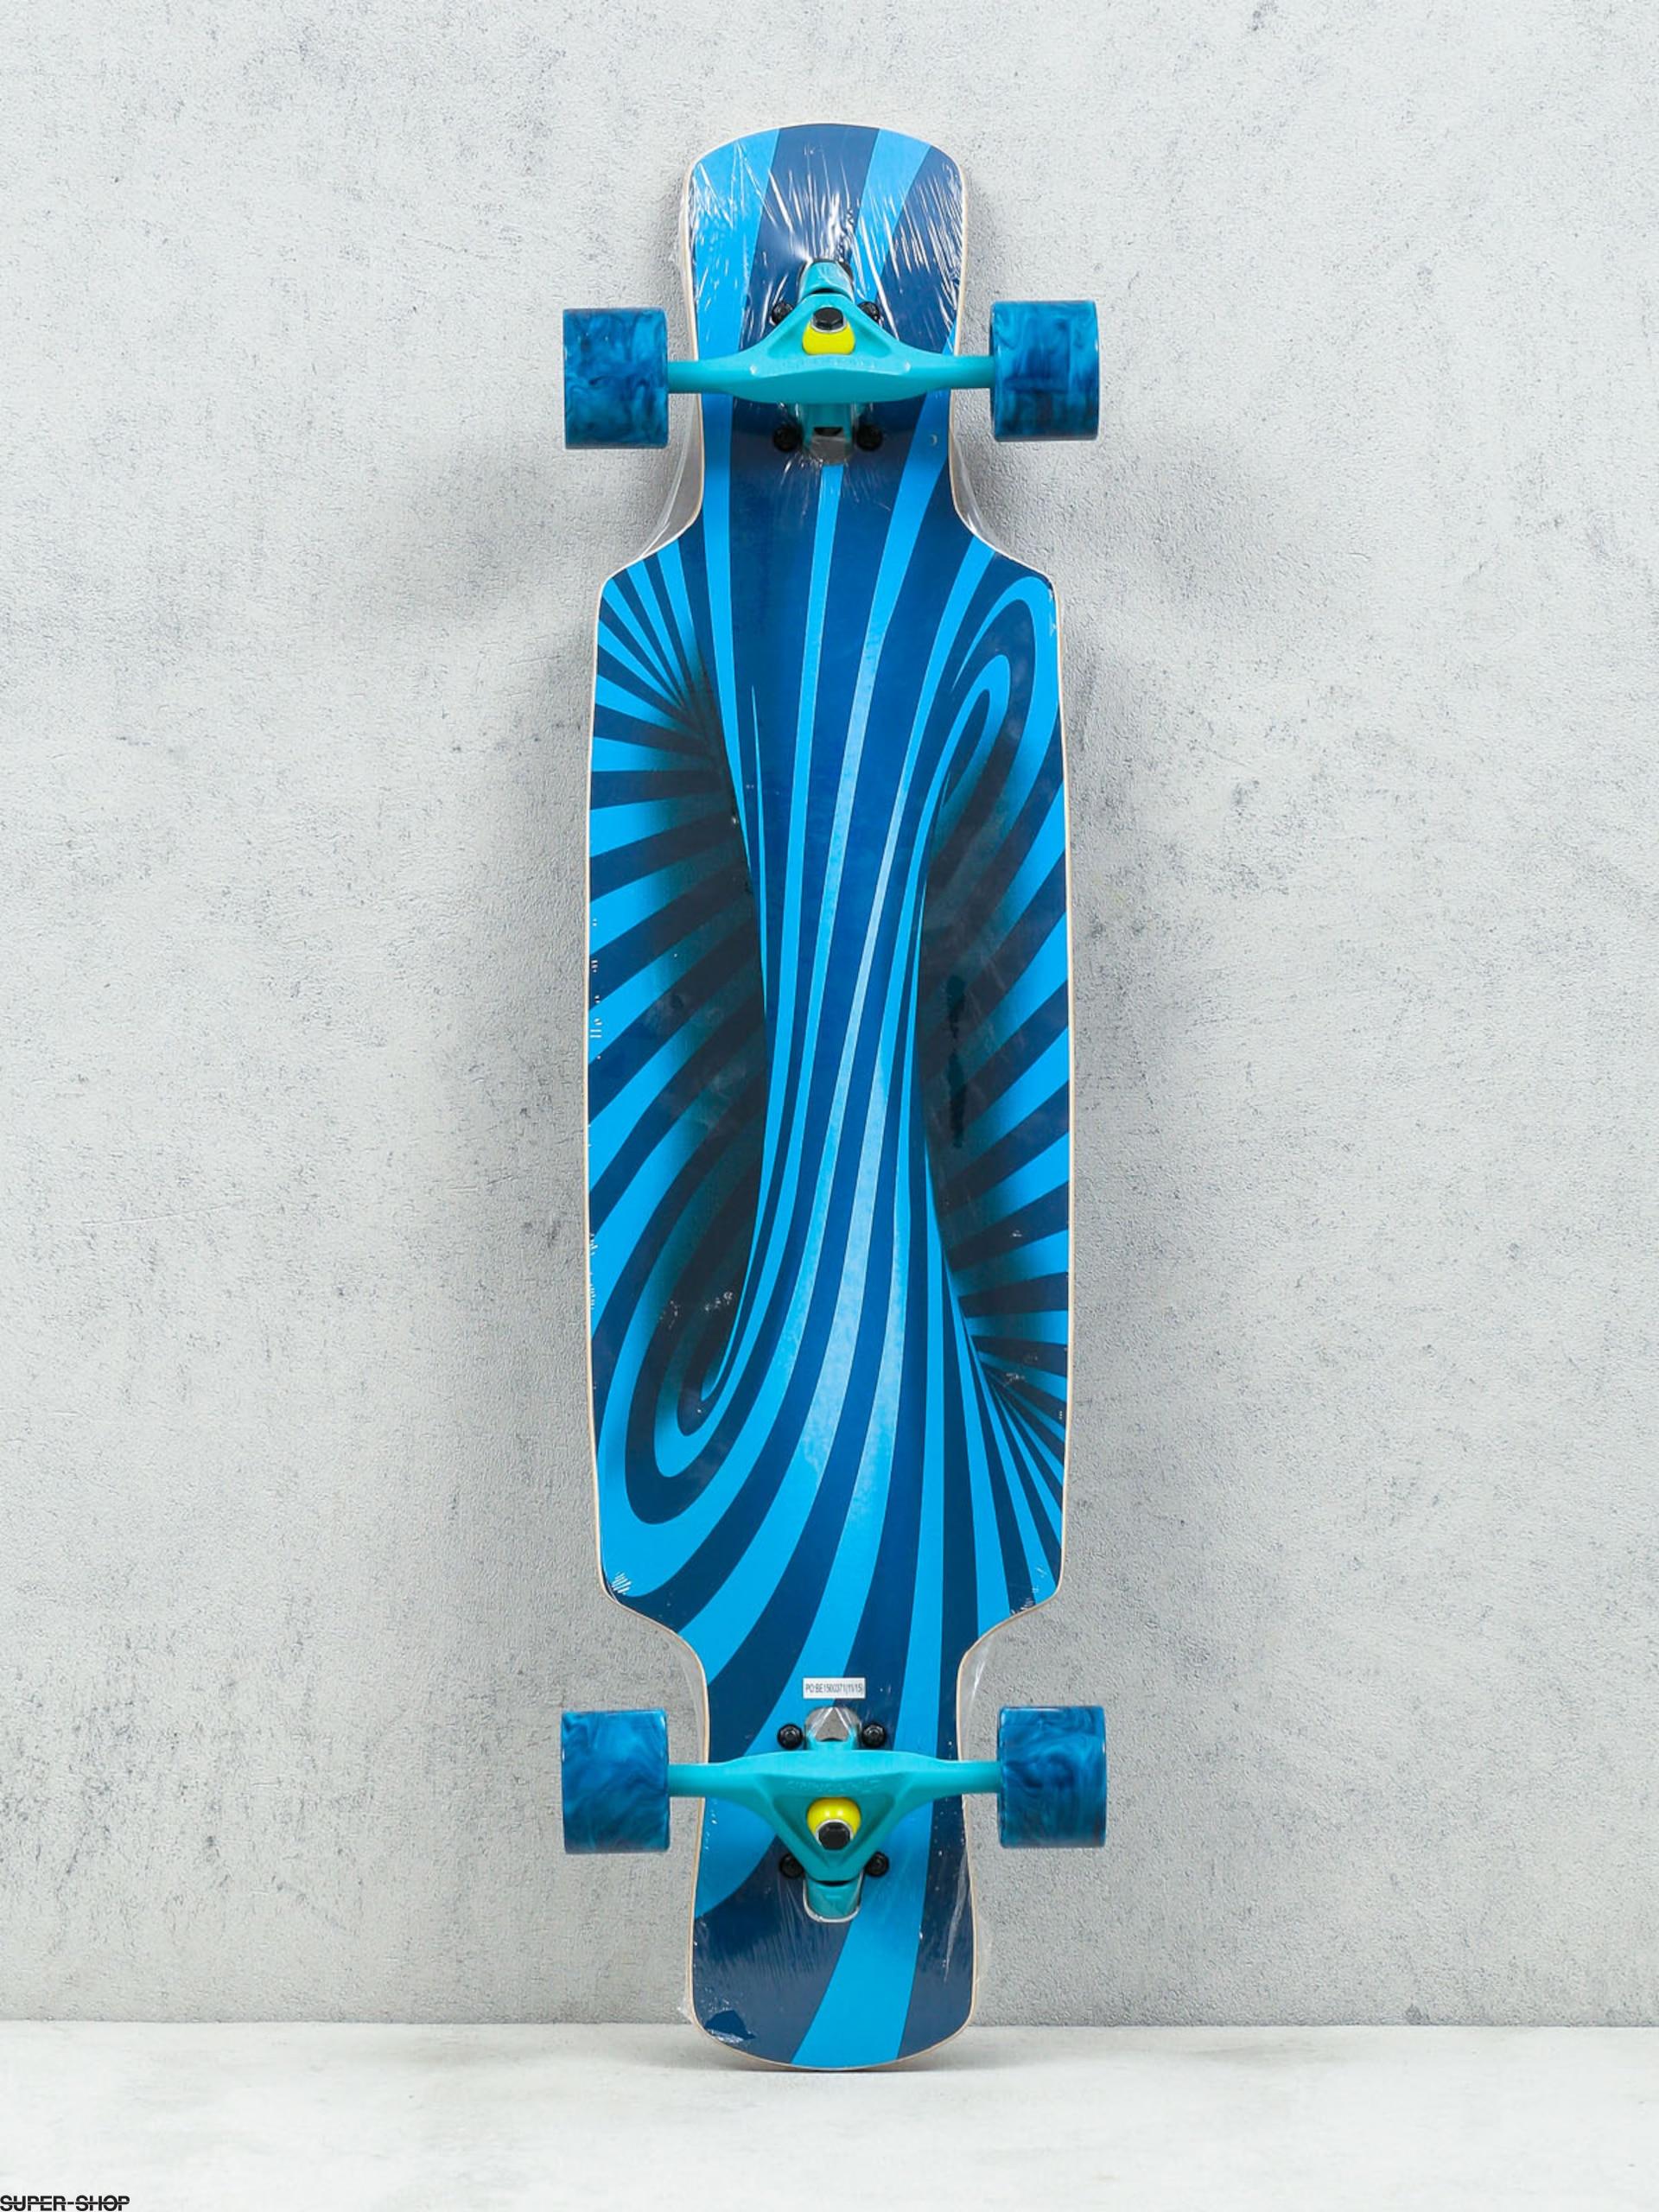 901c05bbda 859142-w1920-choke-longboard-lollipop-elite-dropthrough-blue.jpg